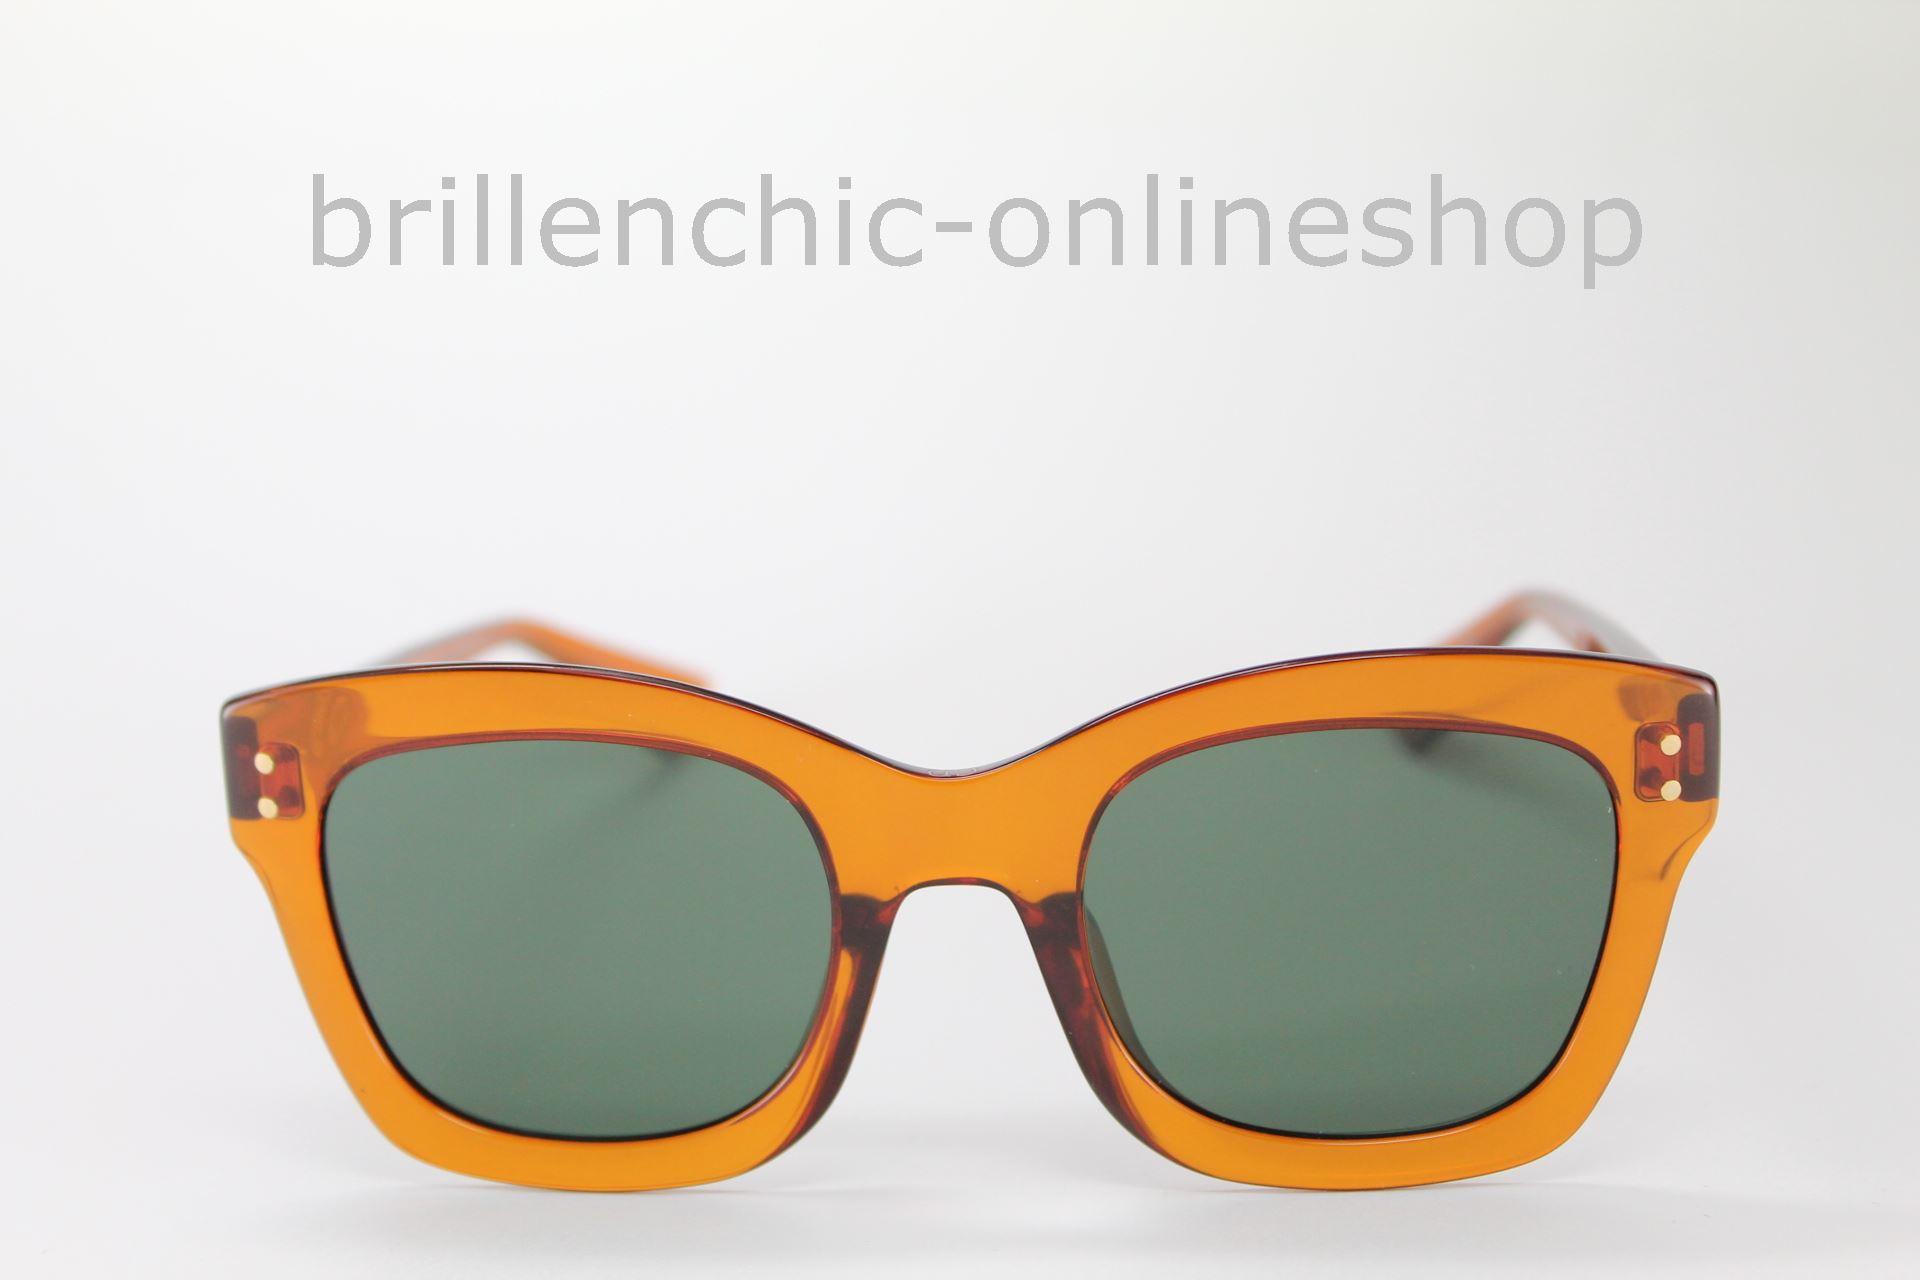 211175e37793b Brillenchic-onlineshop in Berlin - DIOR IZON 2 L7QQT